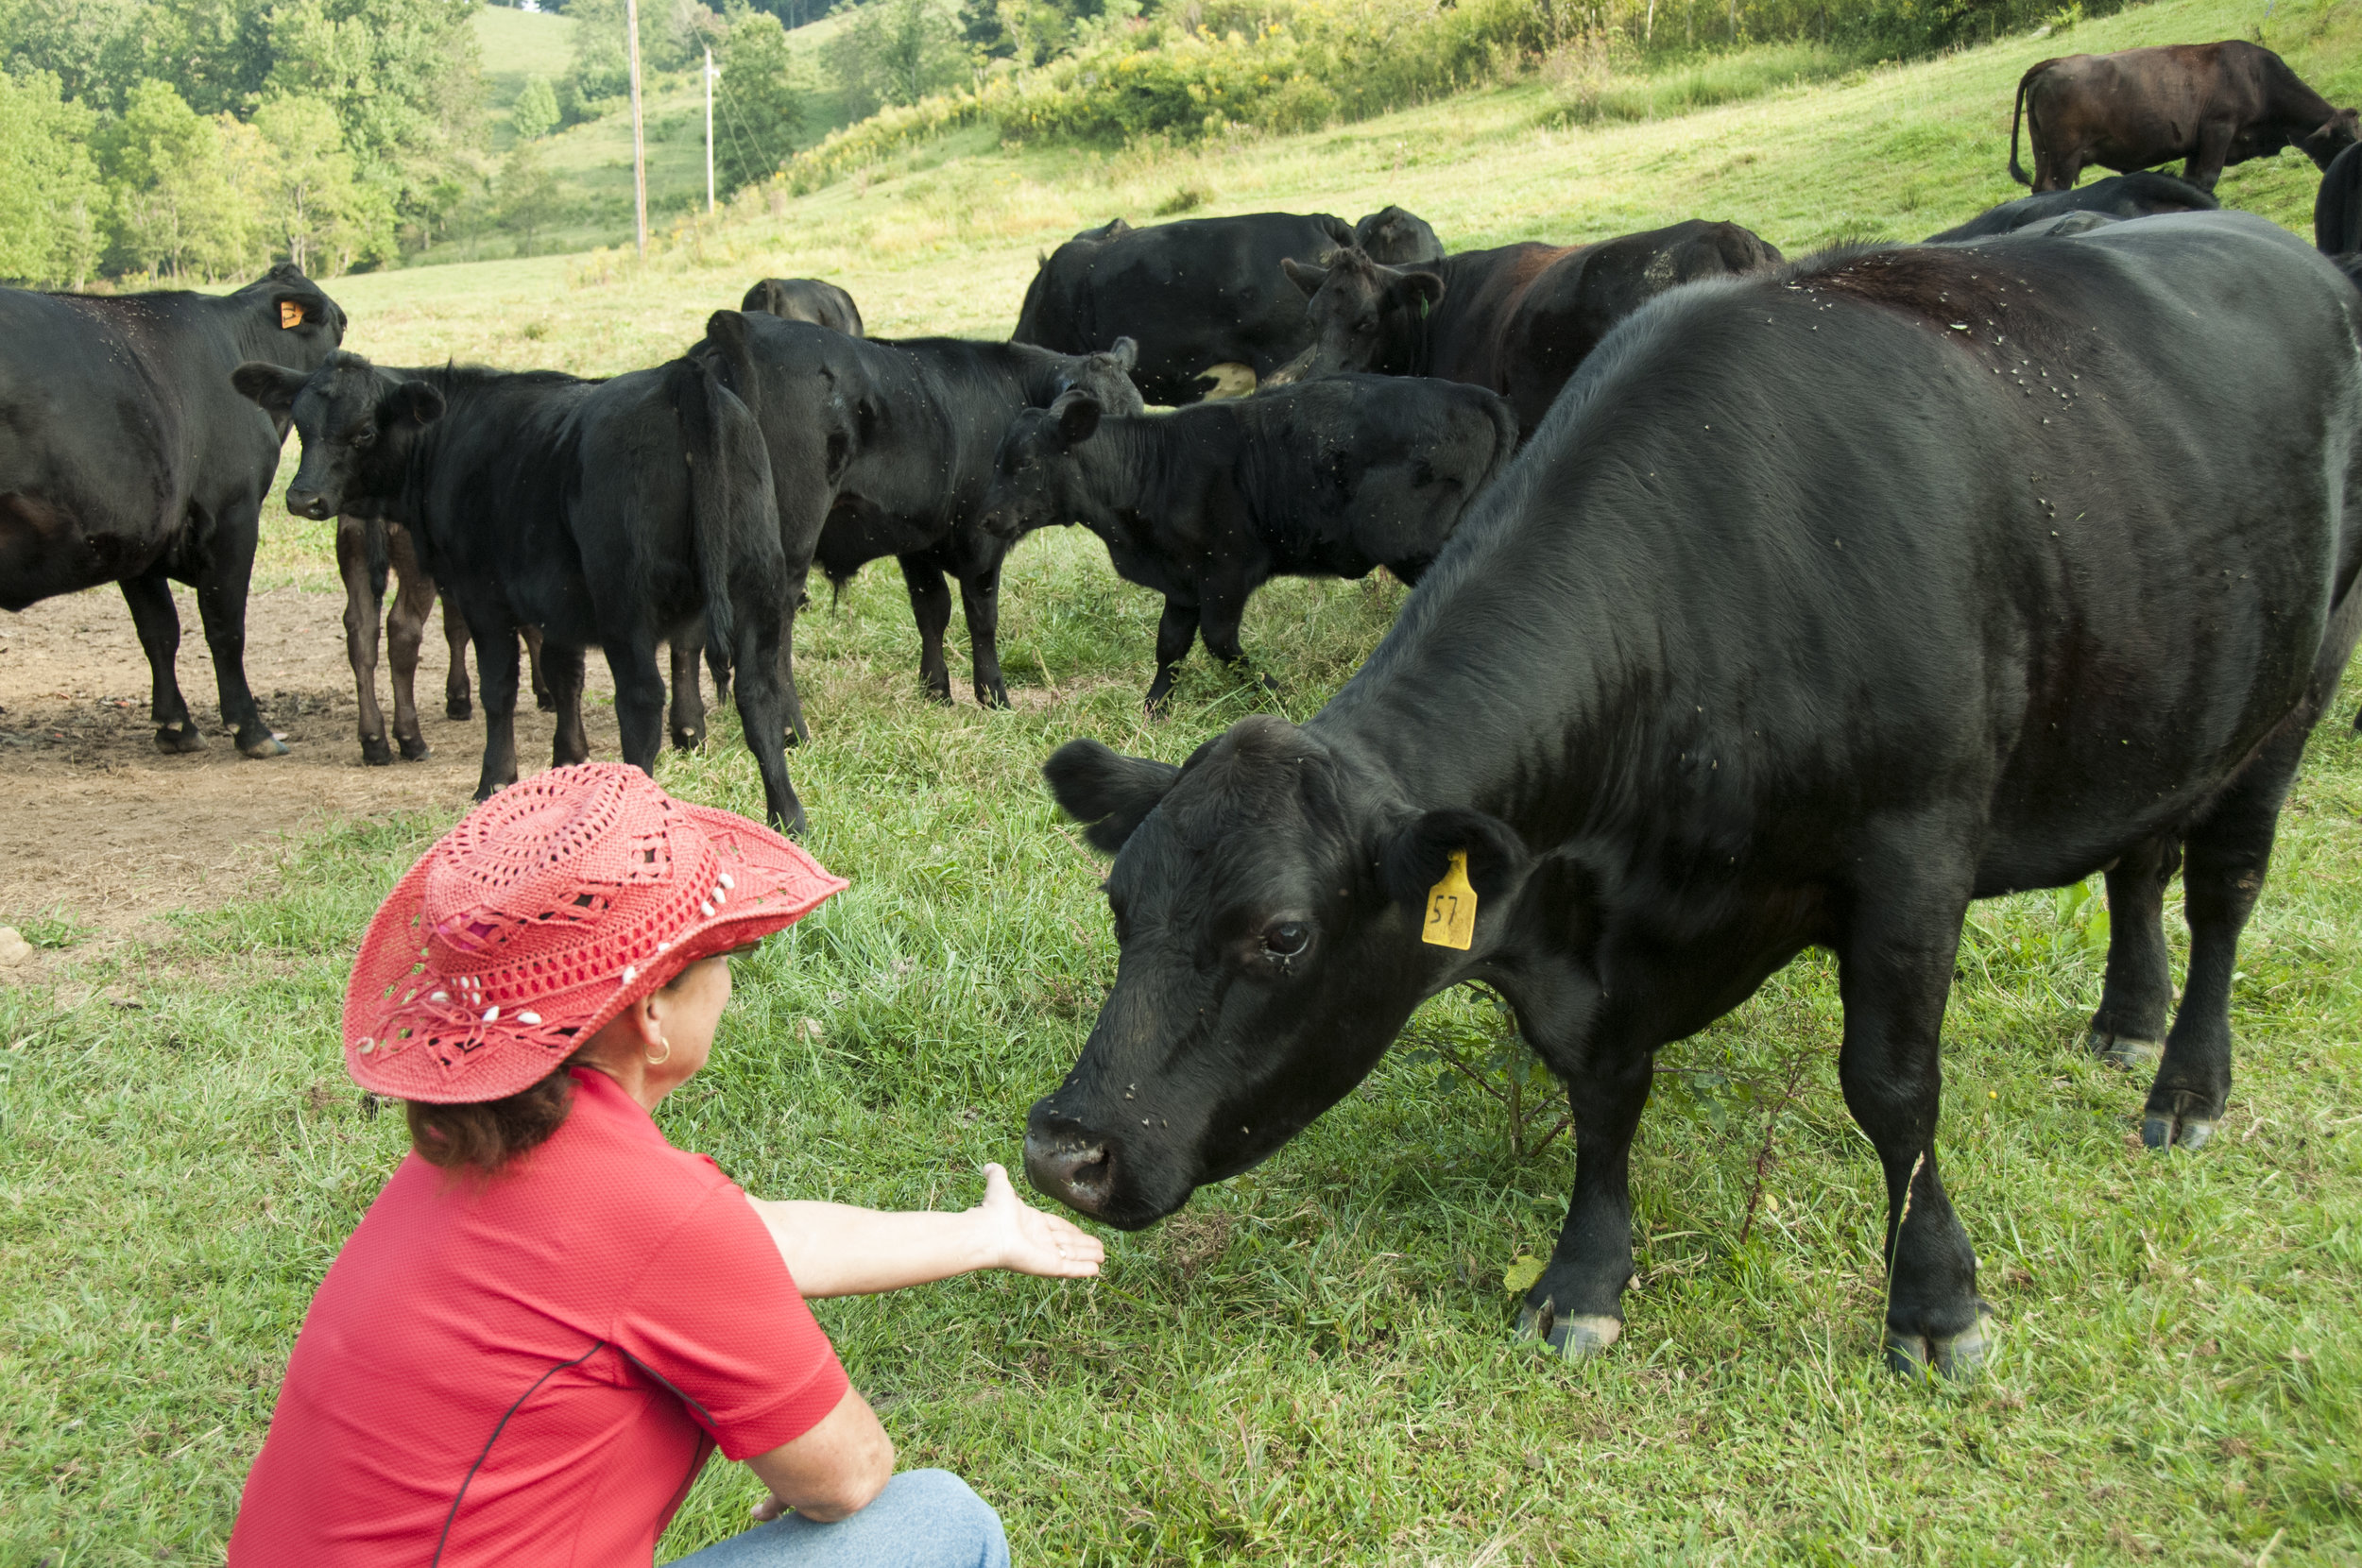 Farmer Carolyn Bradley at Farm House Beef says hello to her herd. Photo courtesy ASAP by Sarah Jones